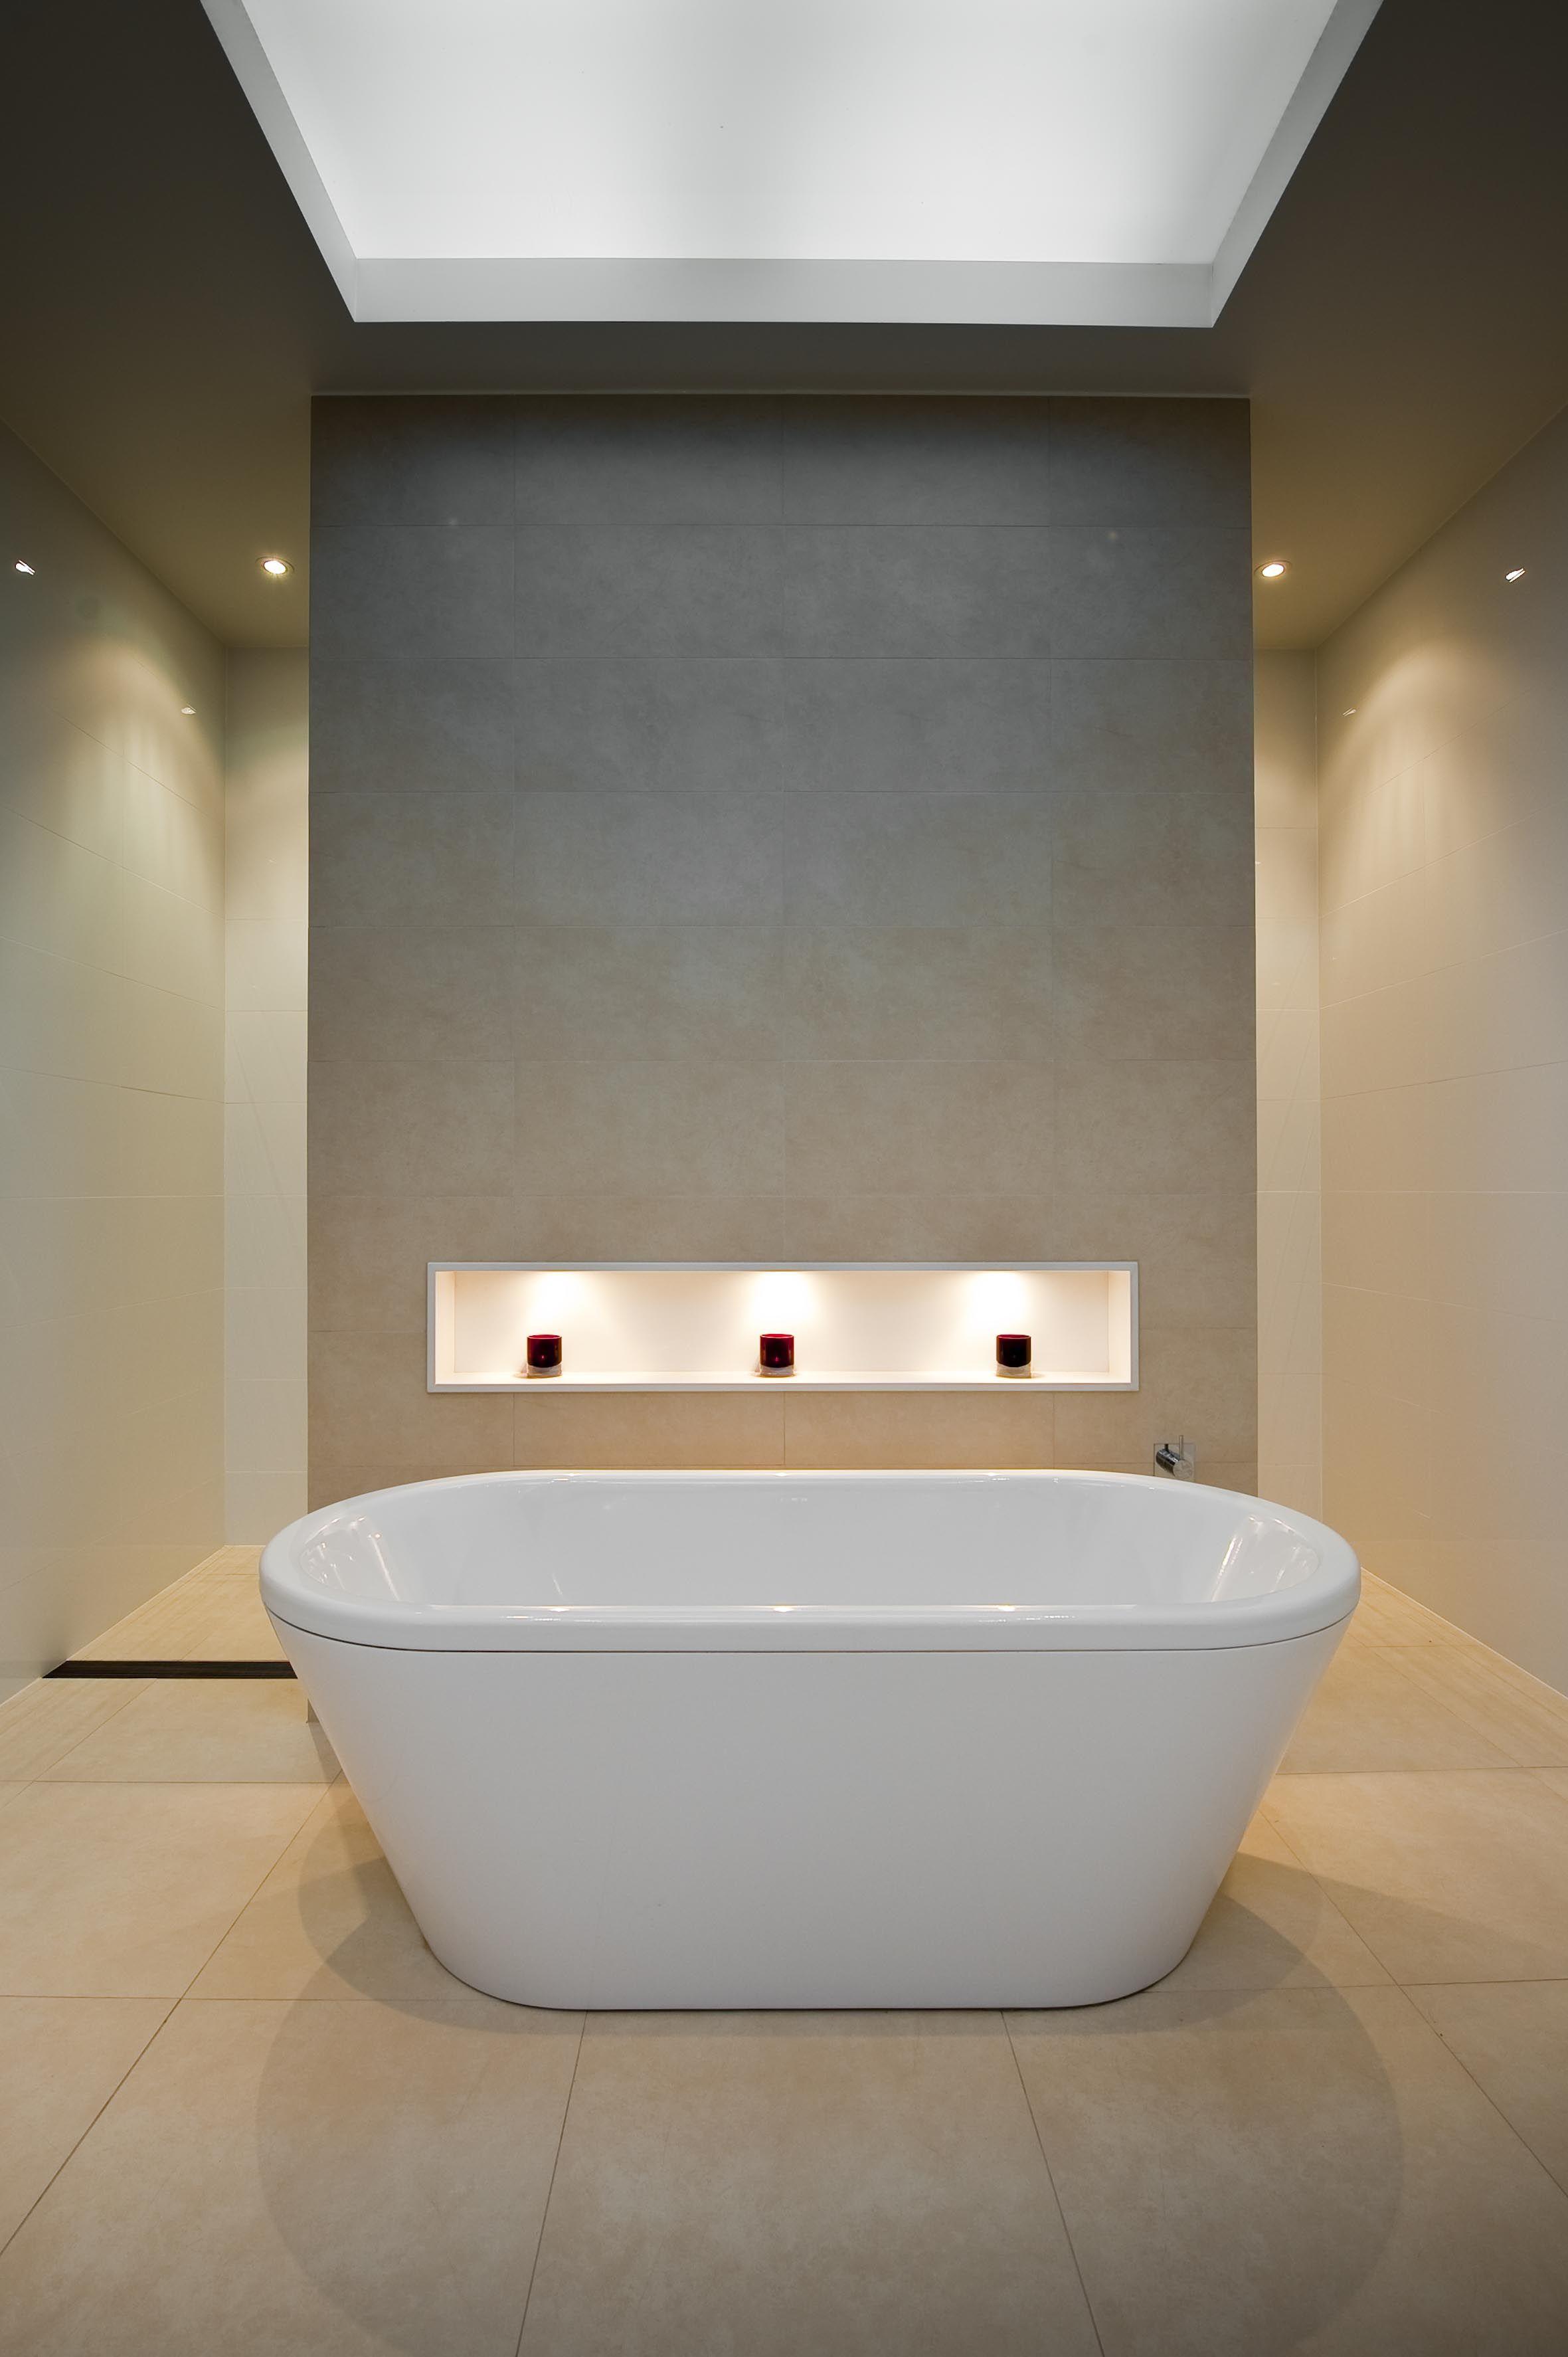 Free standing bath, feature wall, niche | Home | Bathroom ...